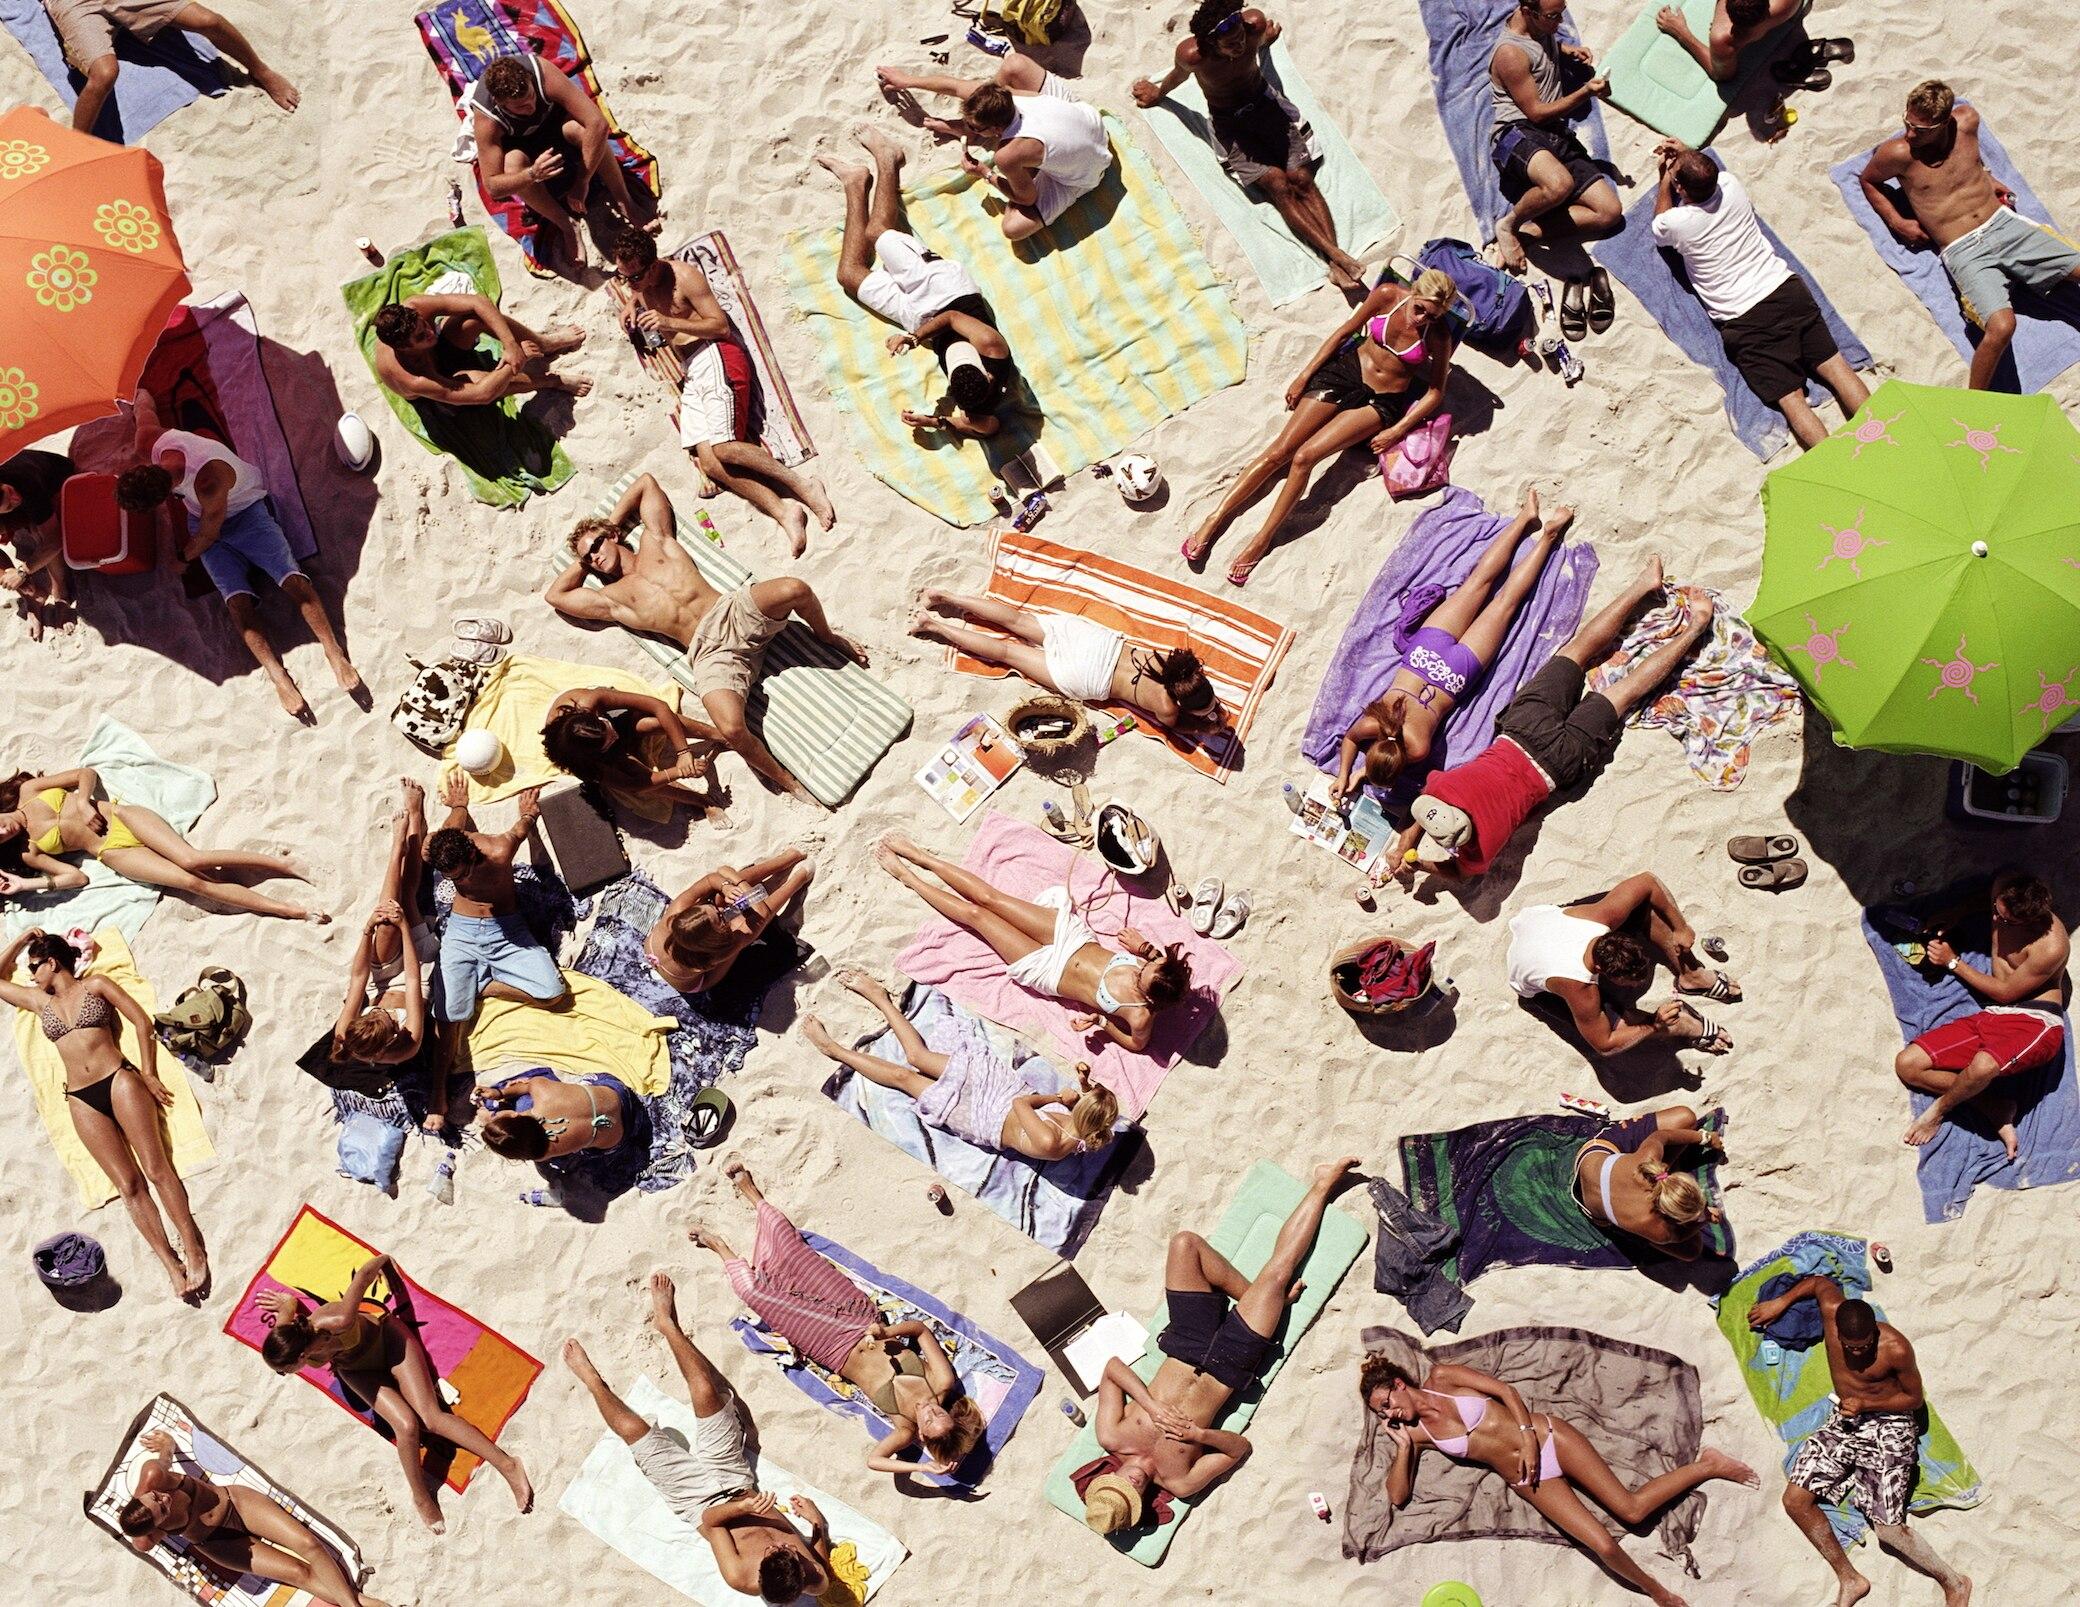 Fkk pärchen ❤️ Strand